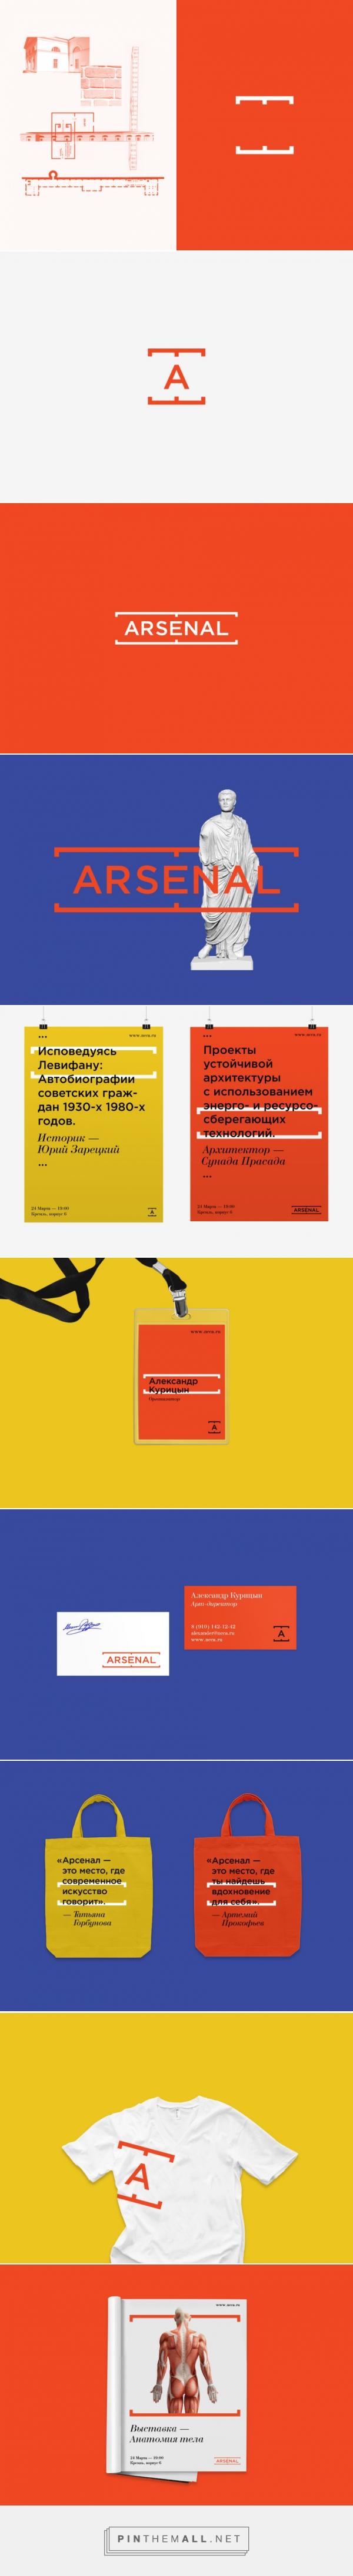 Arsenal Identity - by Viacheslav Novoseltsev / Core77 Design Awards - created via https://pinthemall.net